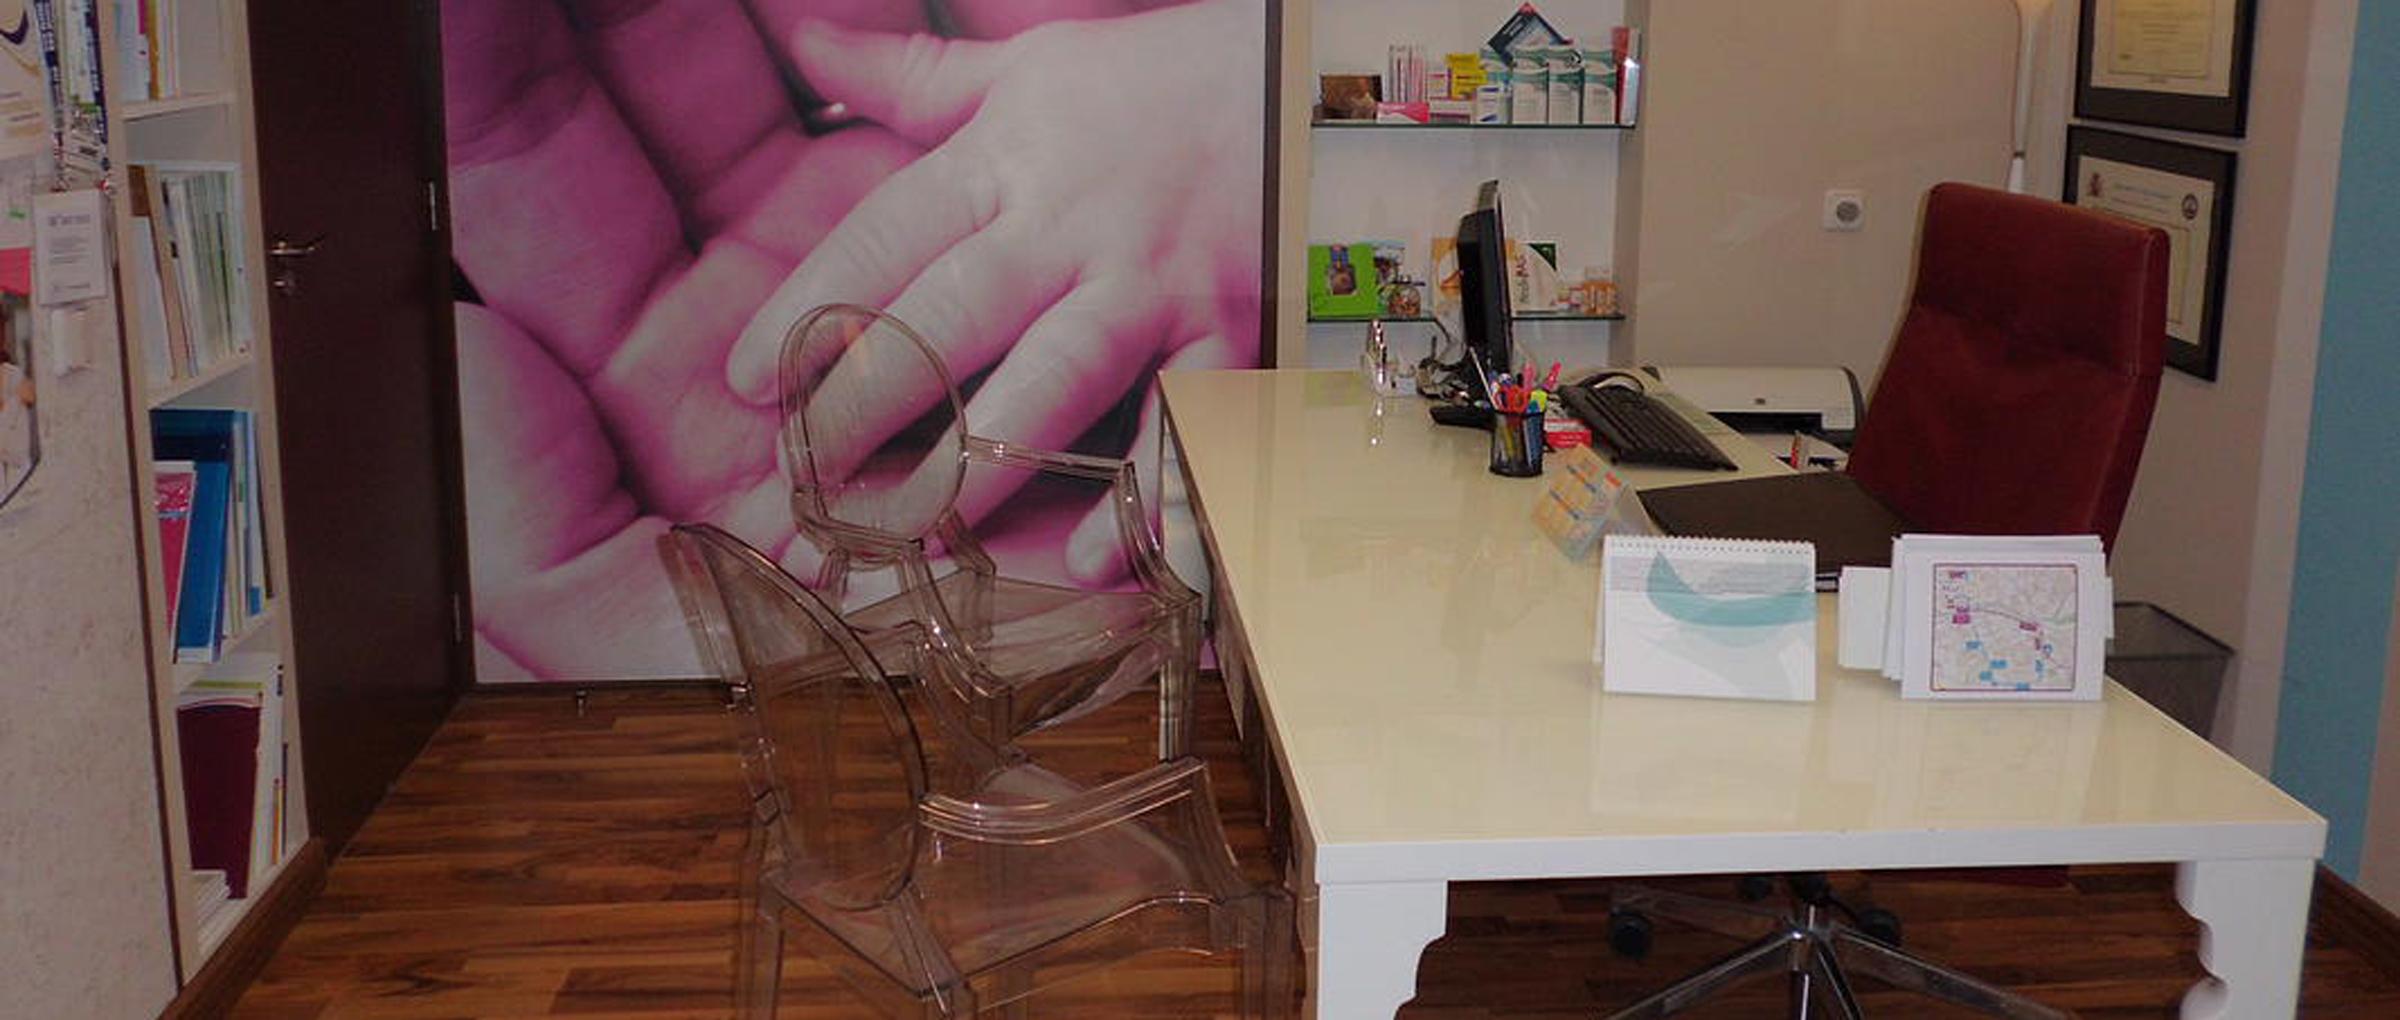 Consulta ginecológica y reproductiva Imar